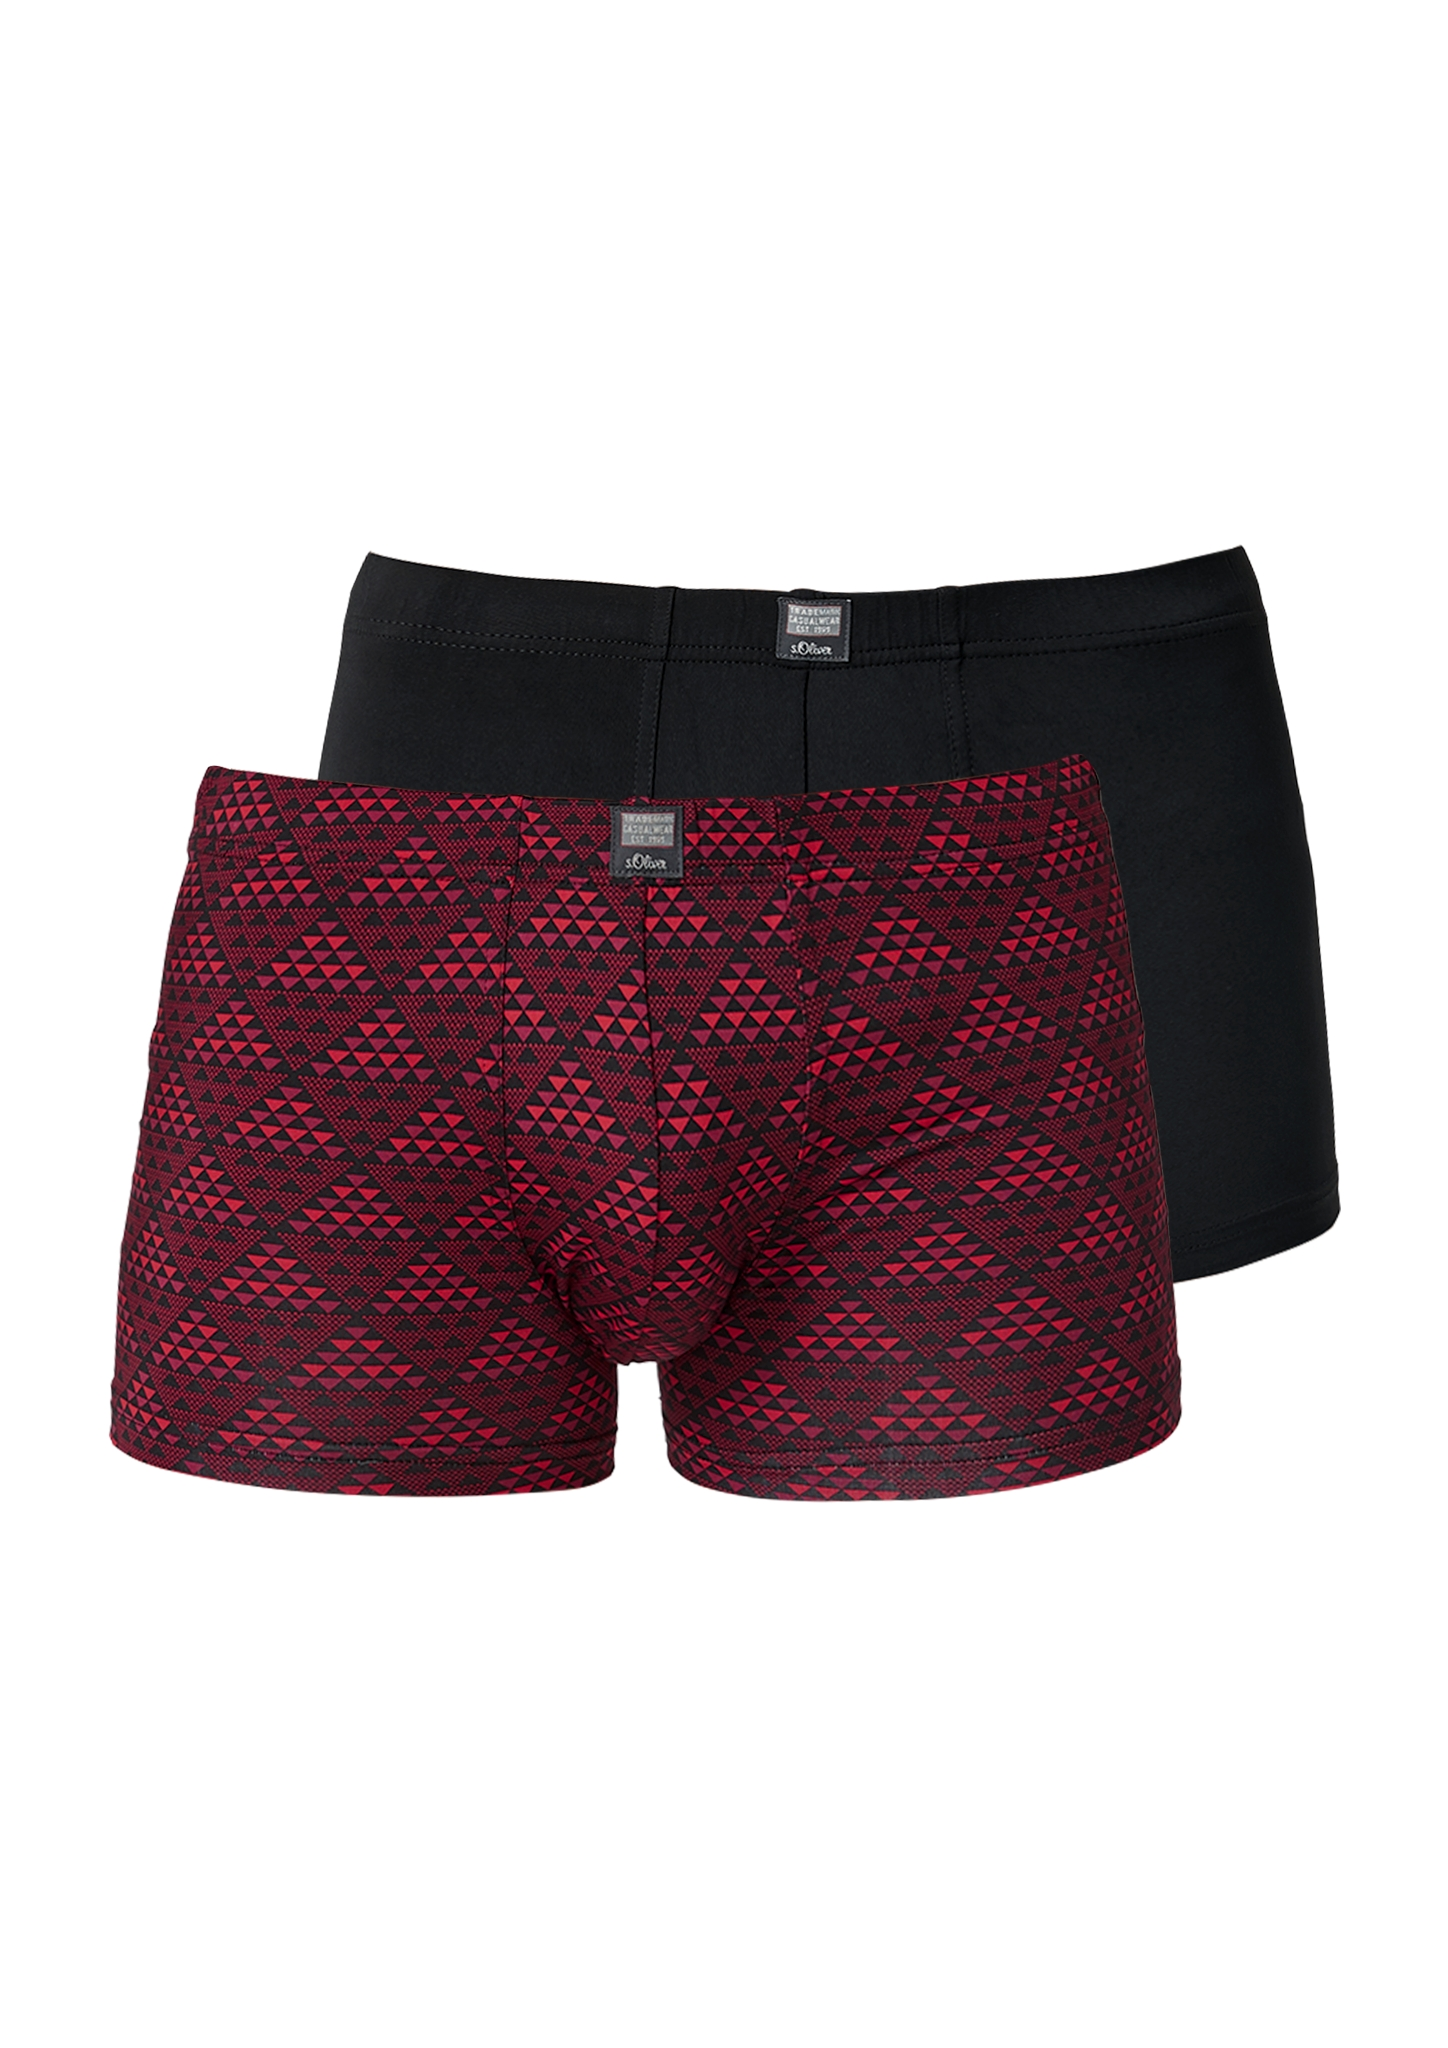 Boxershorts | Bekleidung > Wäsche > Boxershorts | Gelb | 45% polyamid -  45% polyester -  10% elasthan | s.Oliver